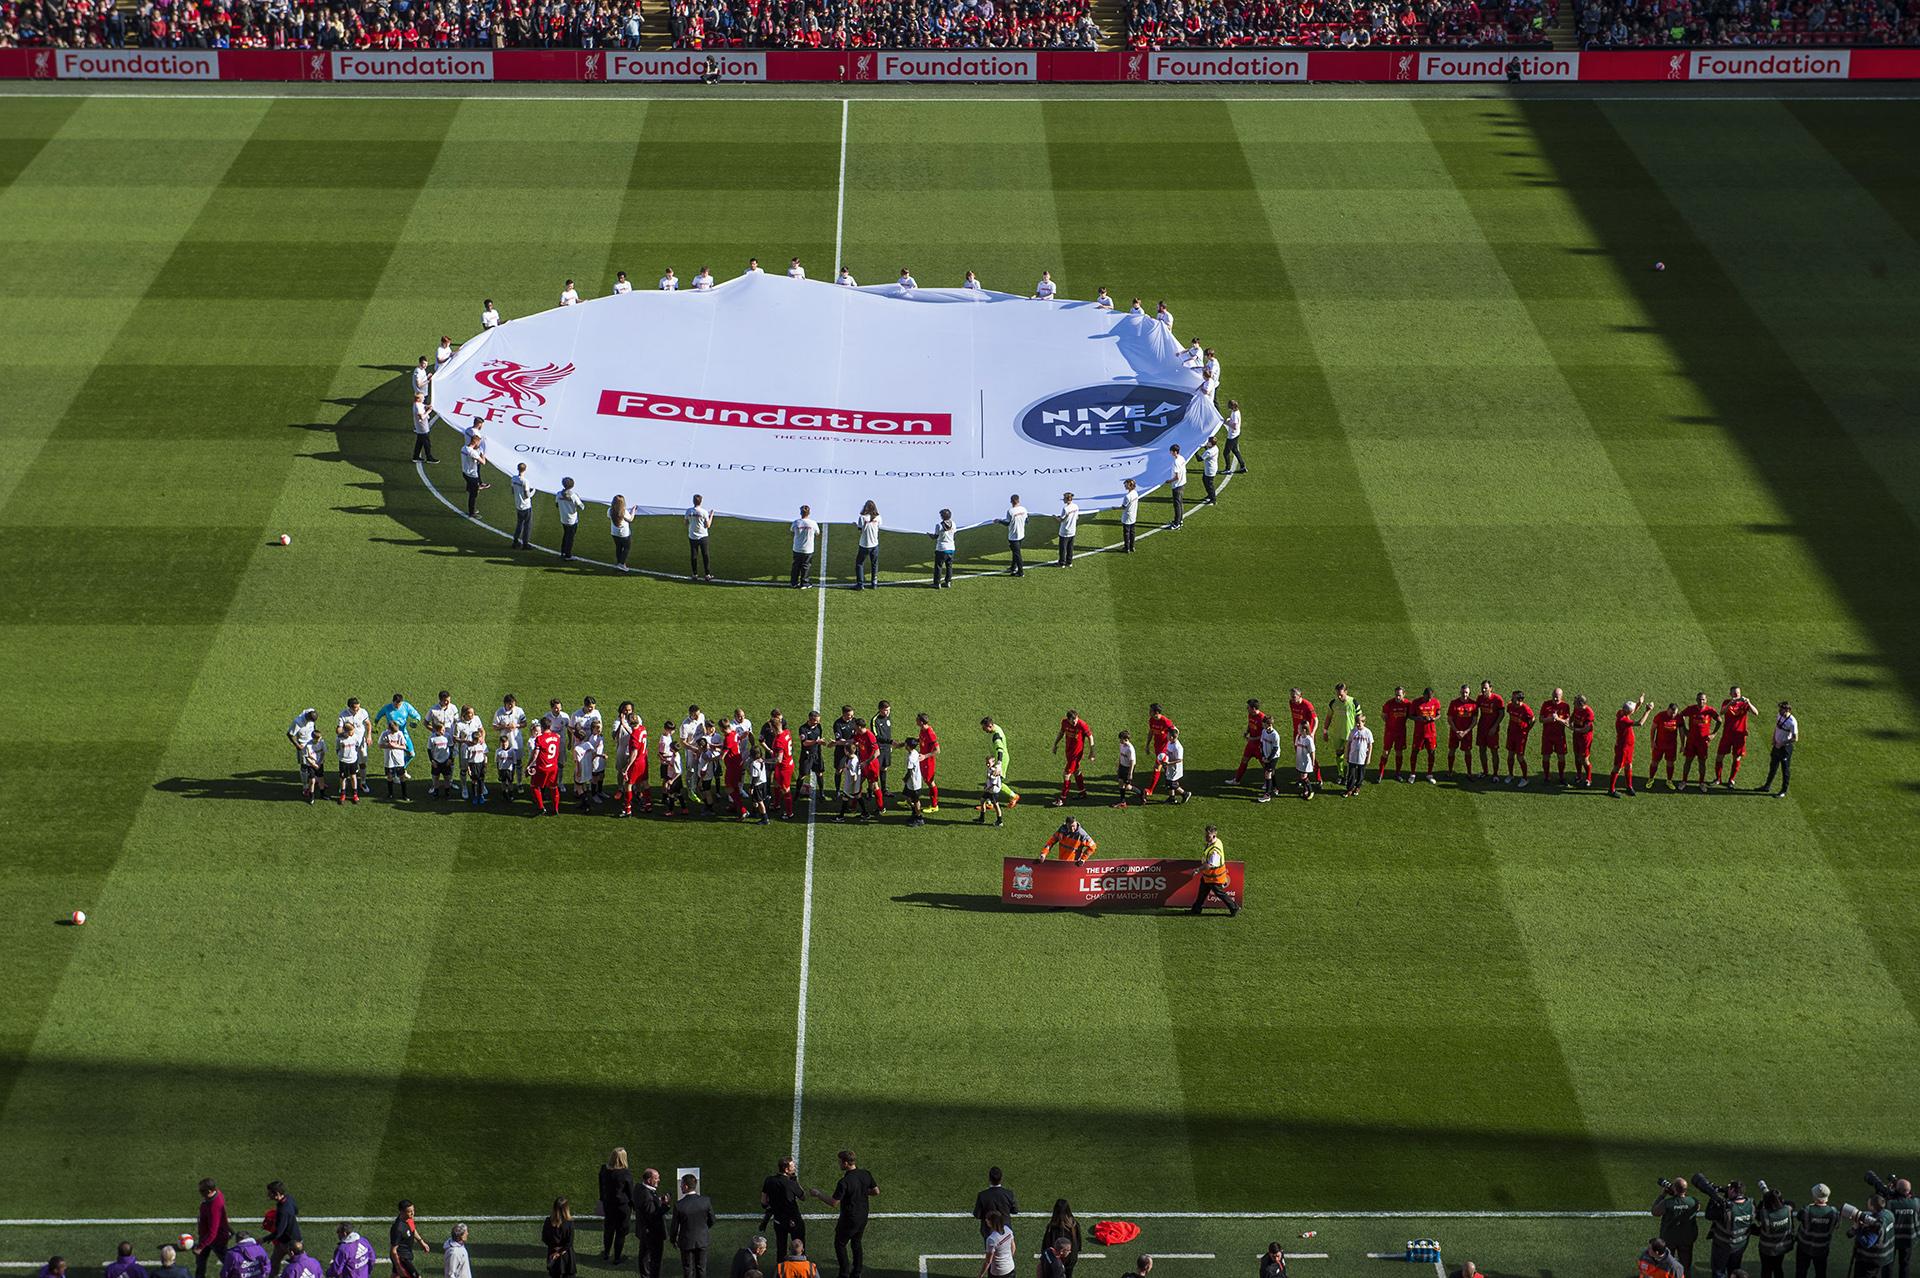 LFC Foundation x Nivea Men Liverpool Legenda vs Real Mardrid Legends.jpg